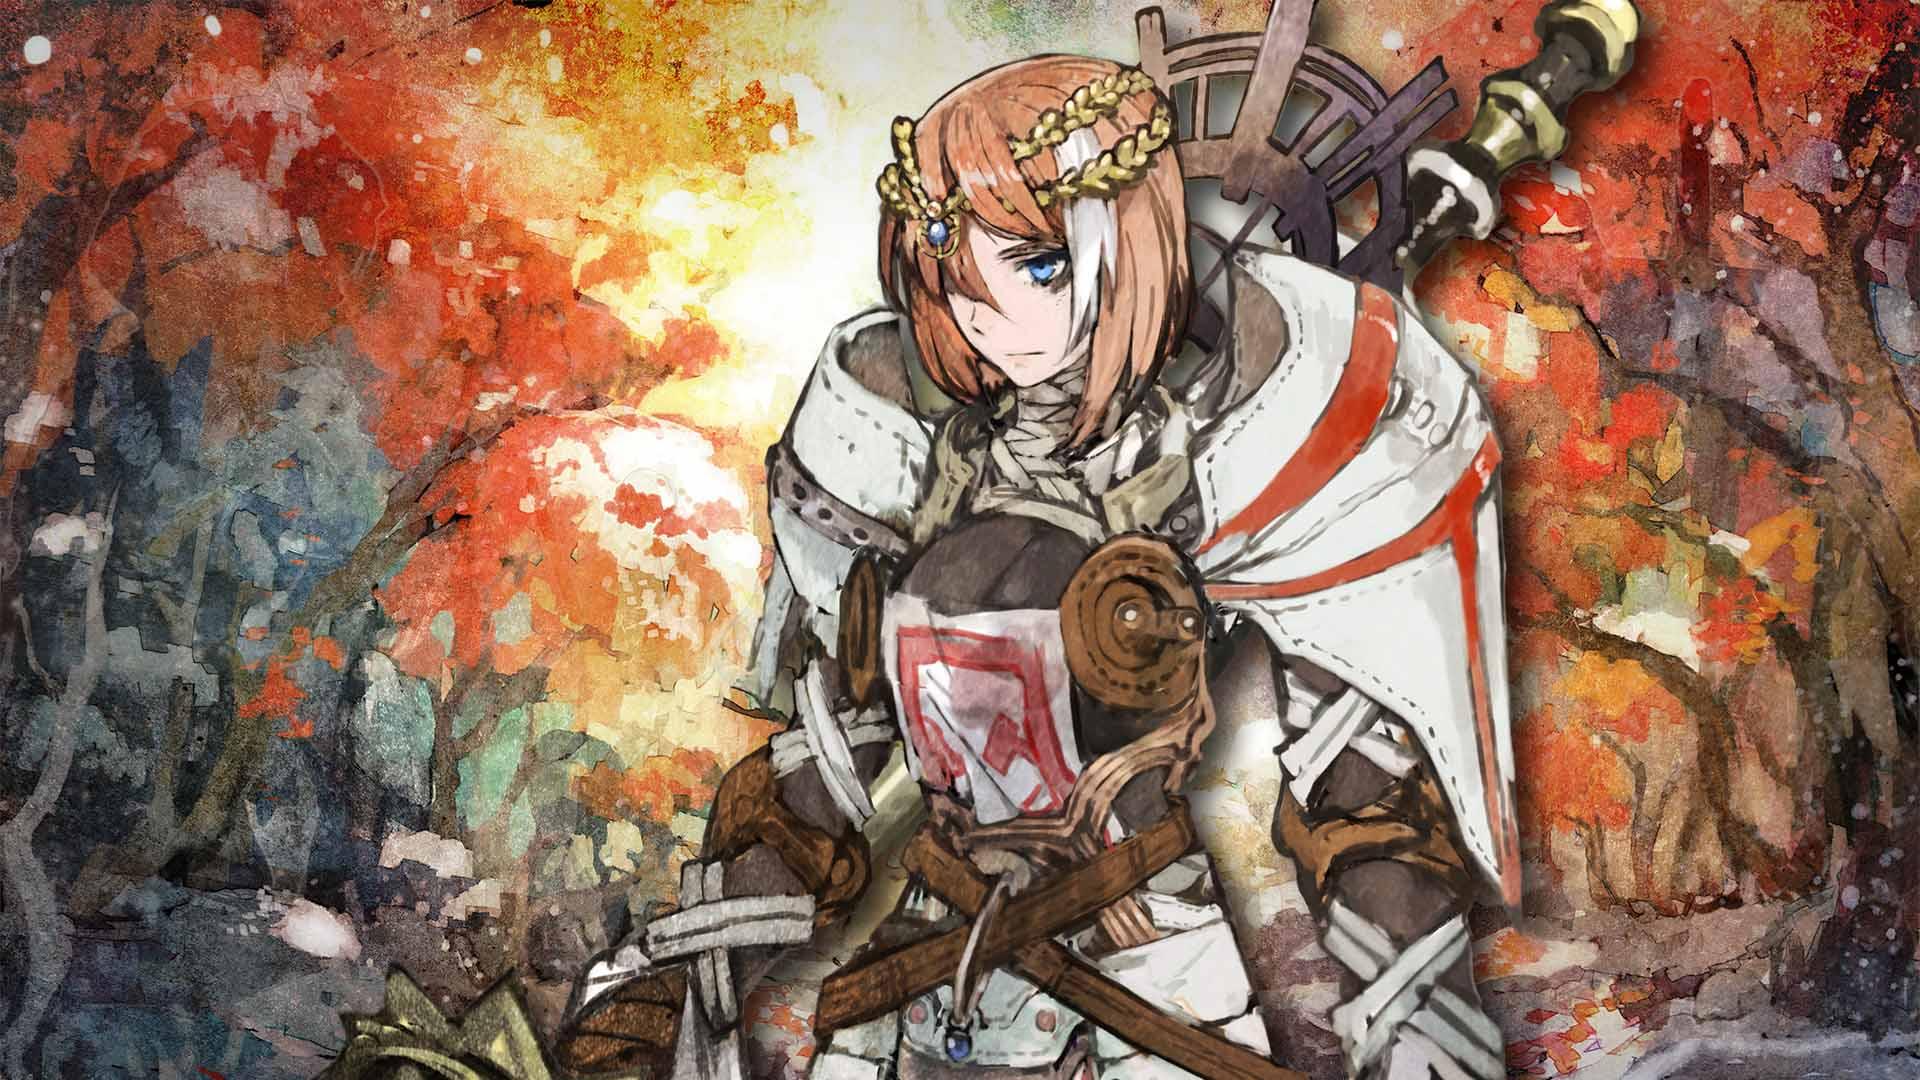 I Am Setsuna Wallpaper 012 Julienne